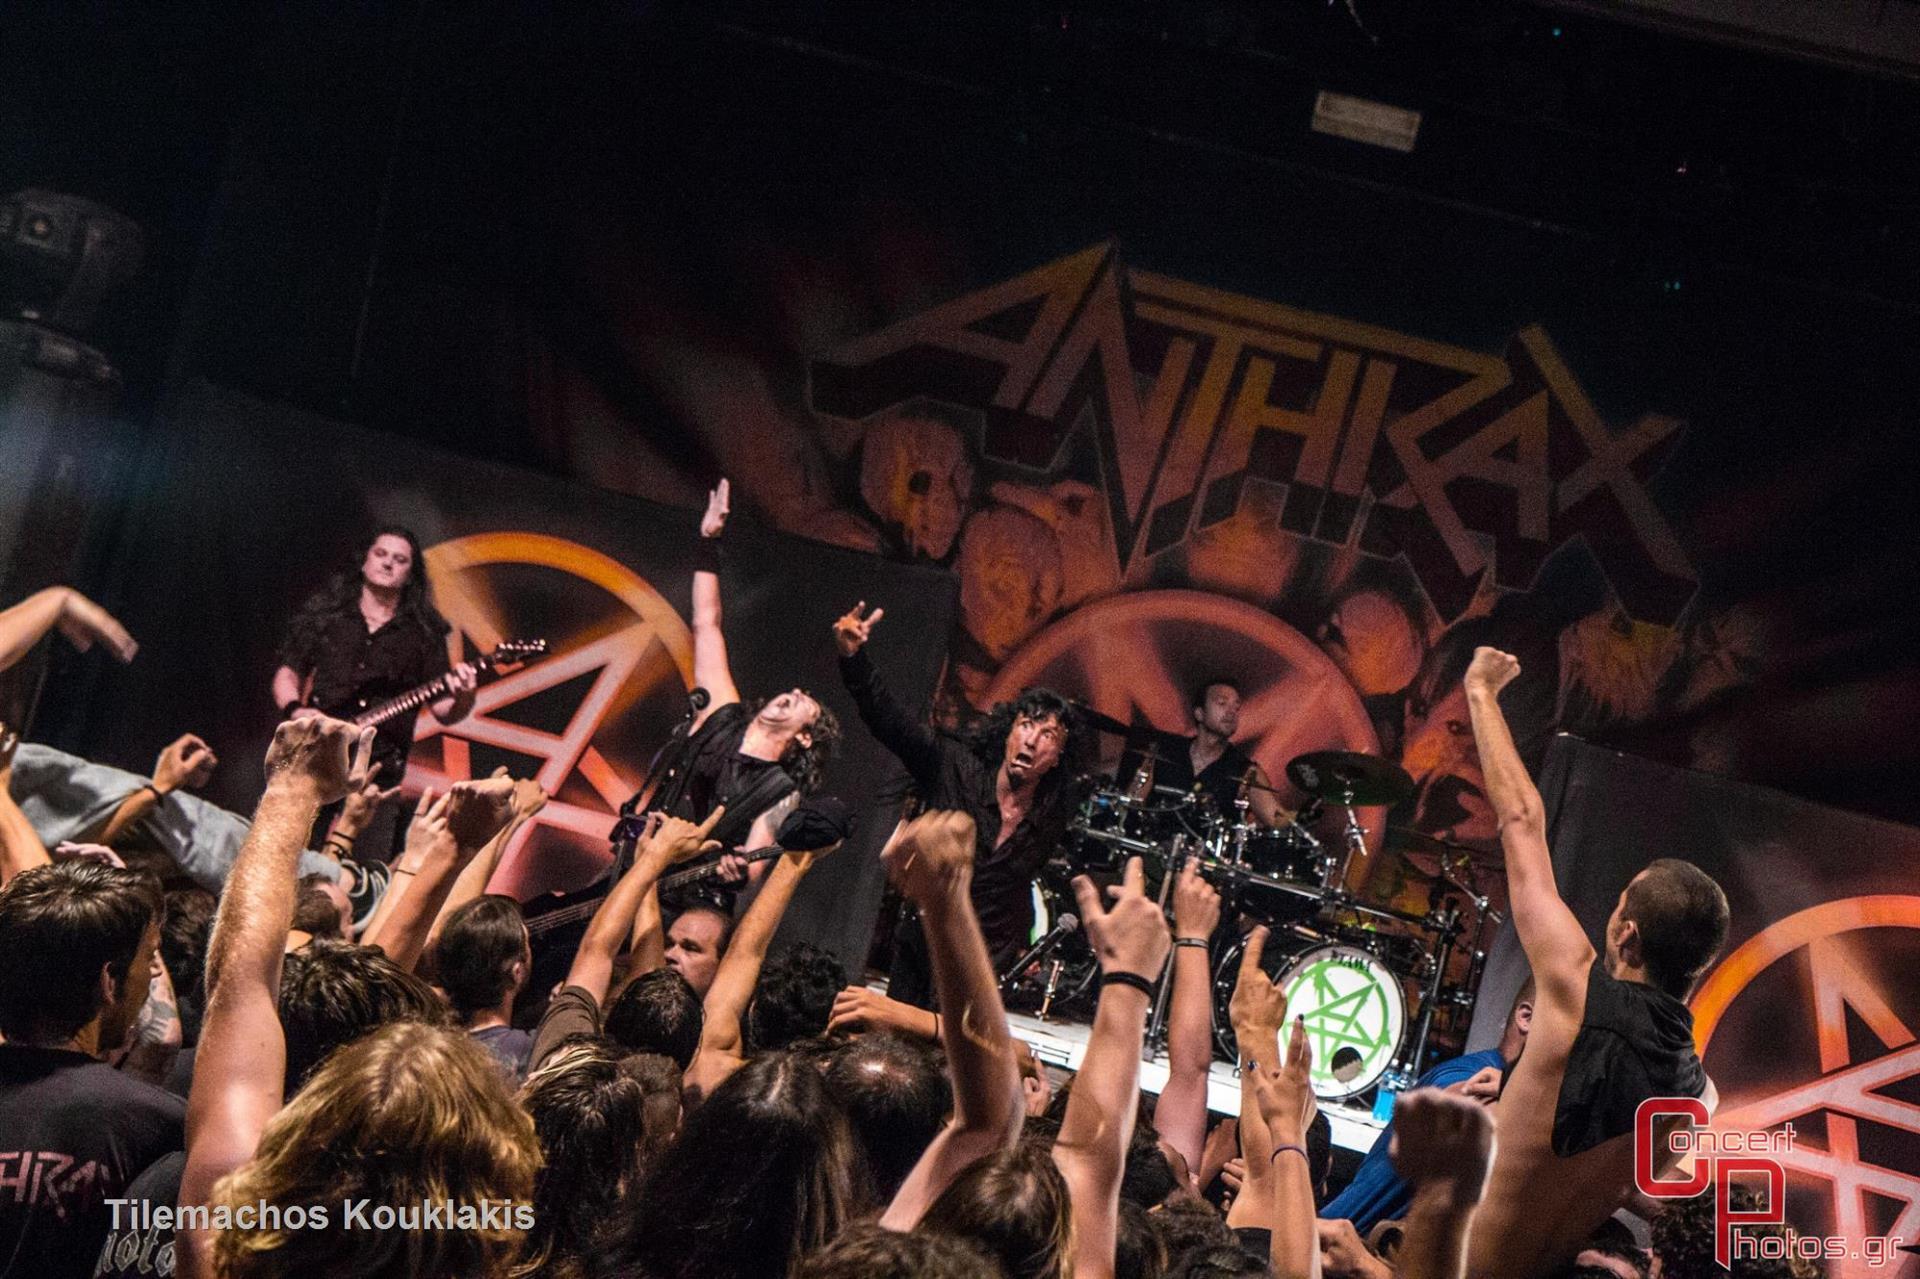 Anthrax-Anthrax photographer: Tilemachos Kouklakis - IMG_2310